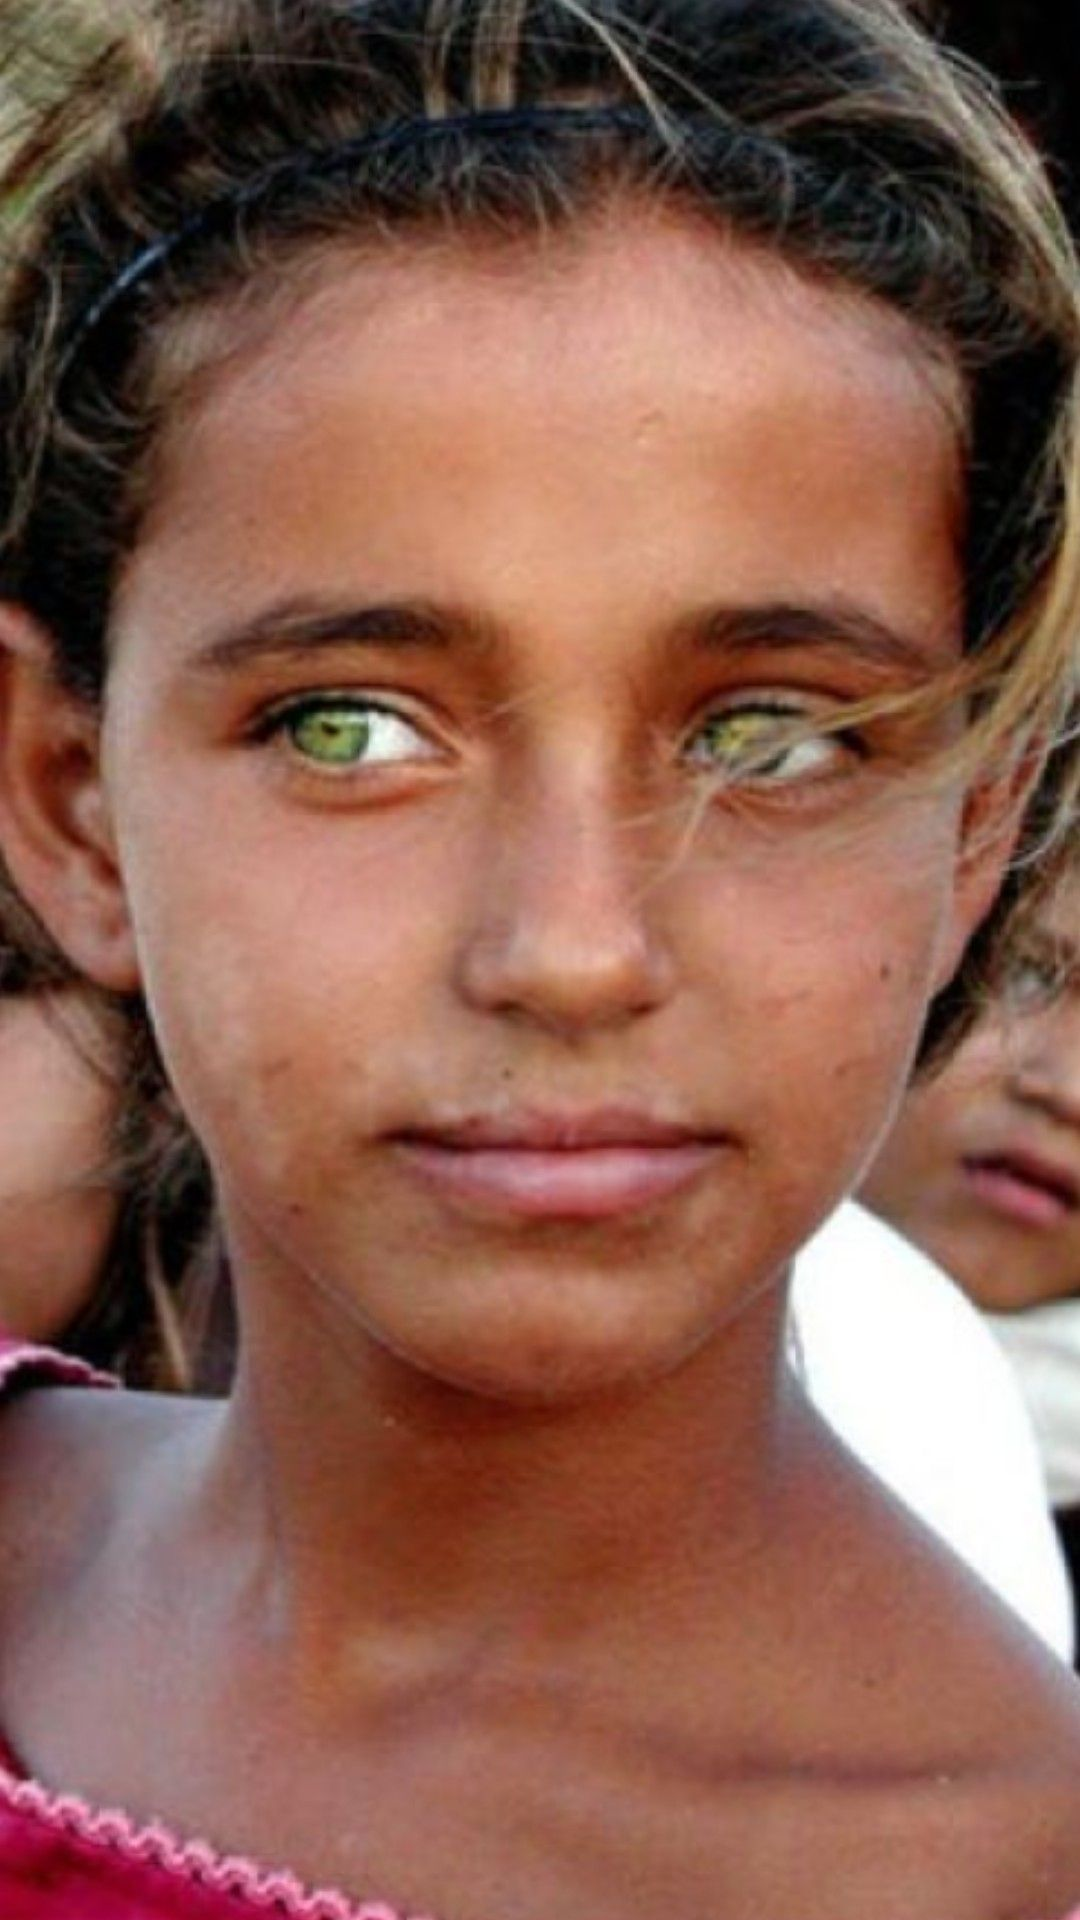 Pin by Σακης Φιλιππας on ΜΑΤΙΑ | Stunning eyes, Most